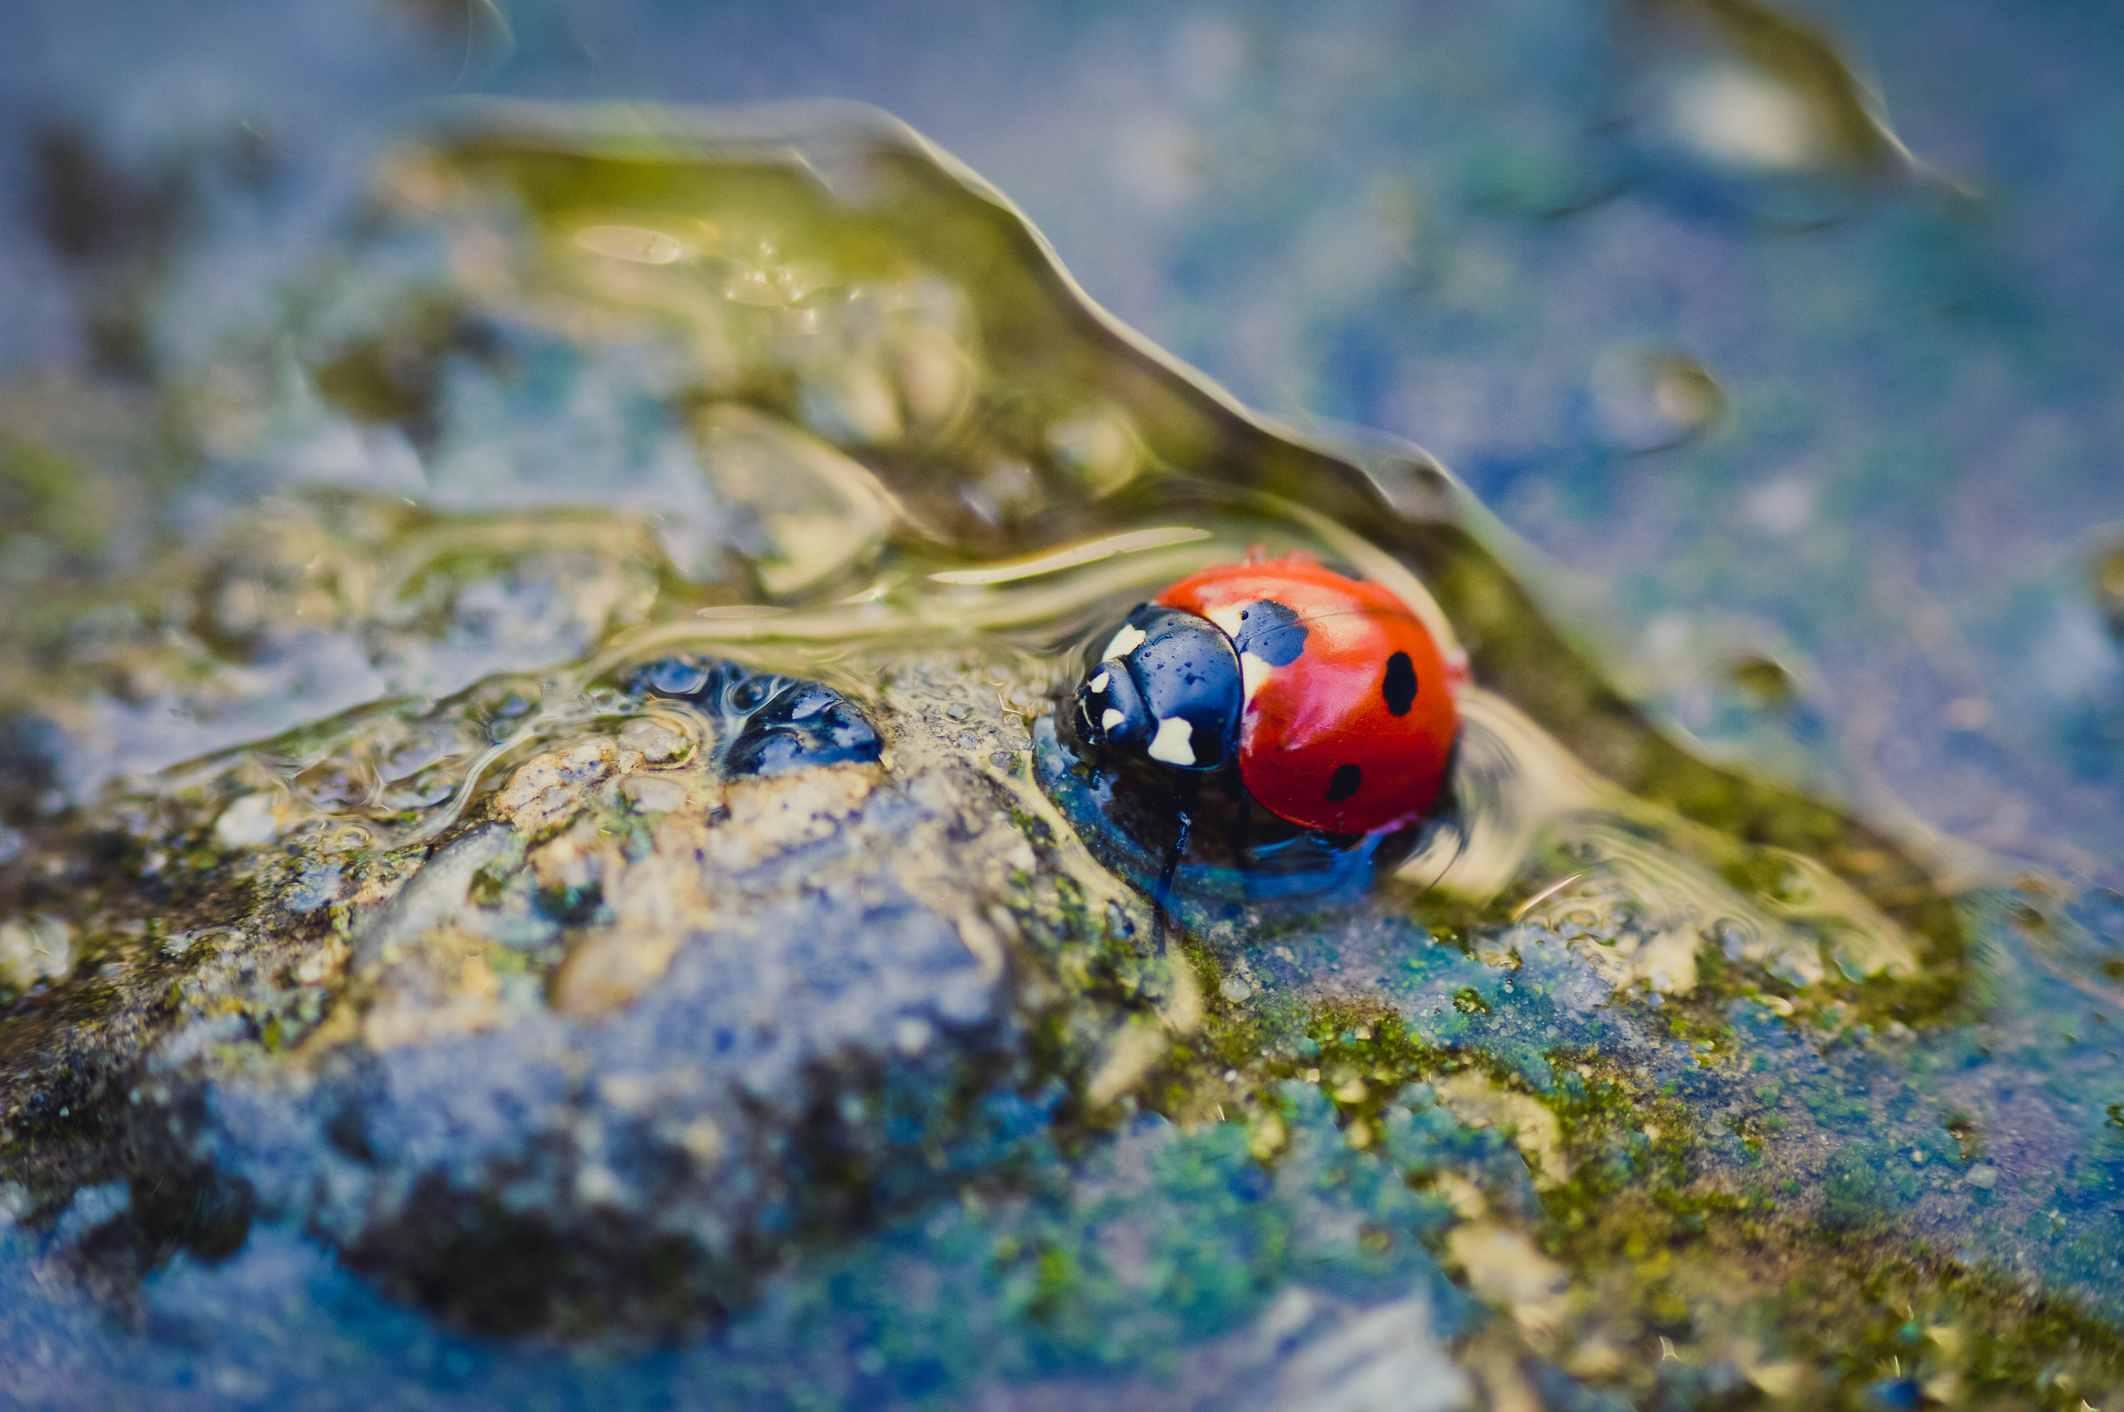 Ladybug in a puddle.